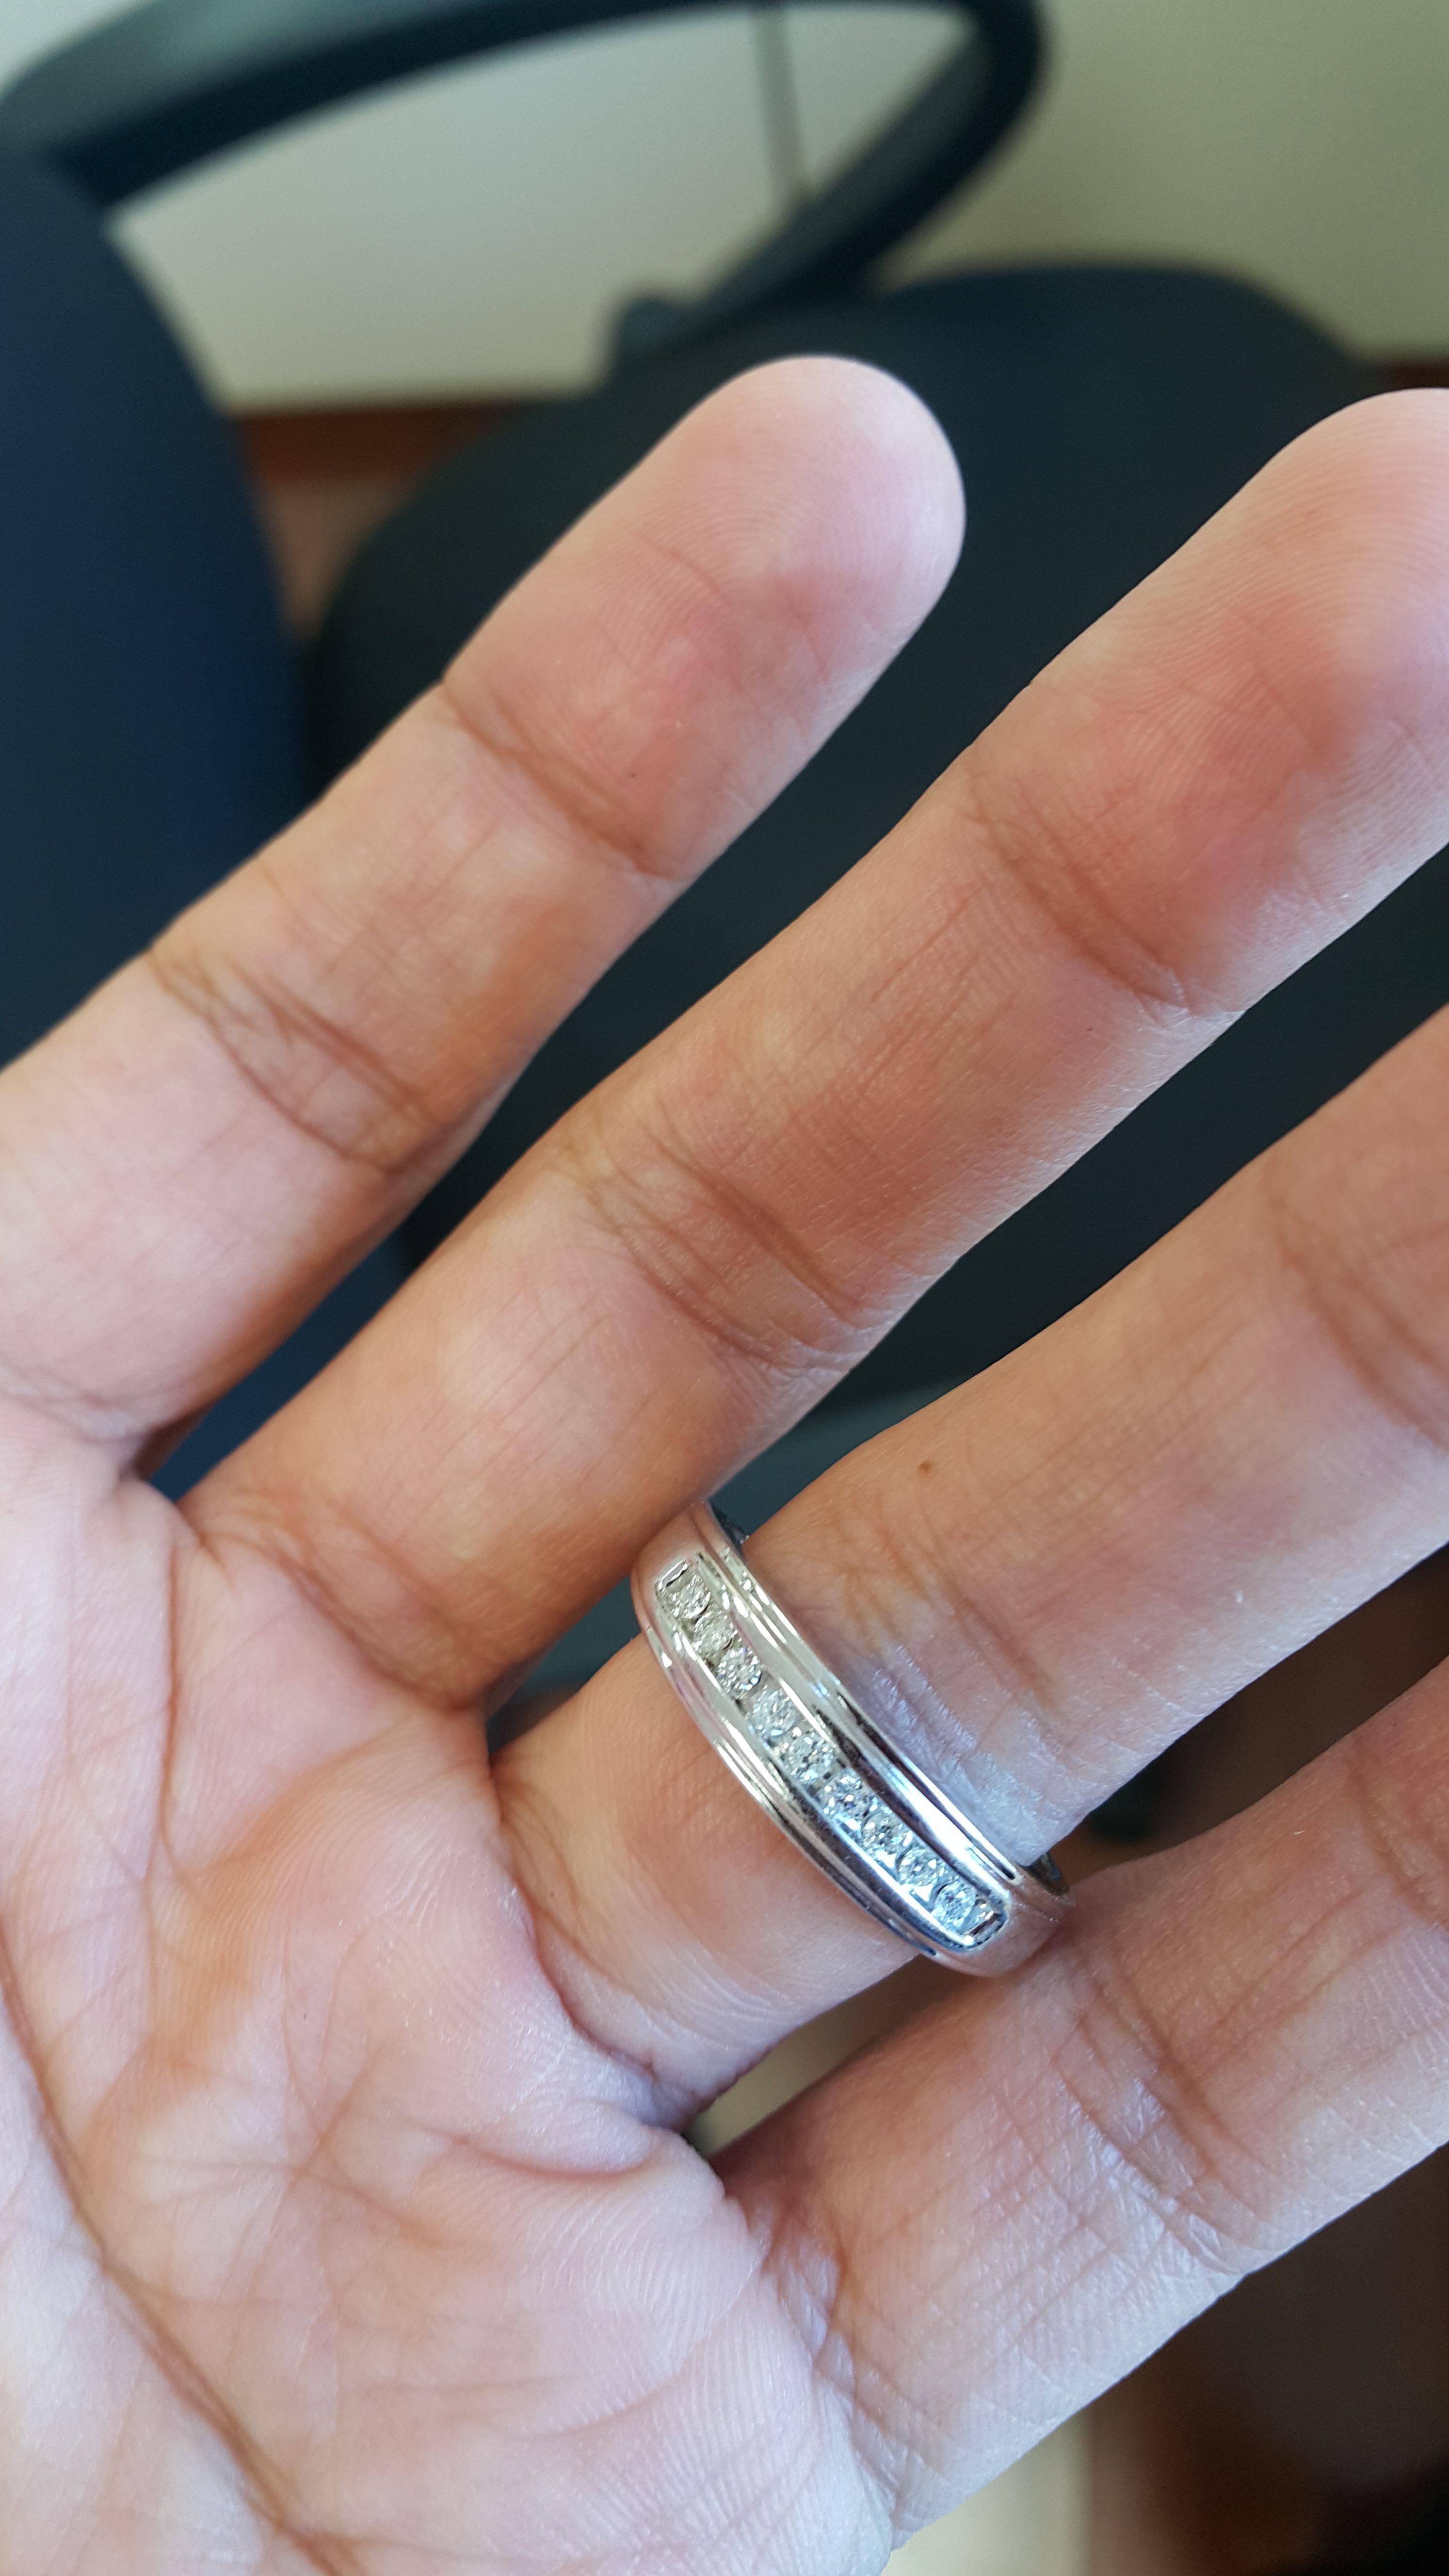 Rings On Hand Mens Wedding Band Bt501wm Wedding Ring Trio Sets Engagement Rings For Men Mens Wedding Bands